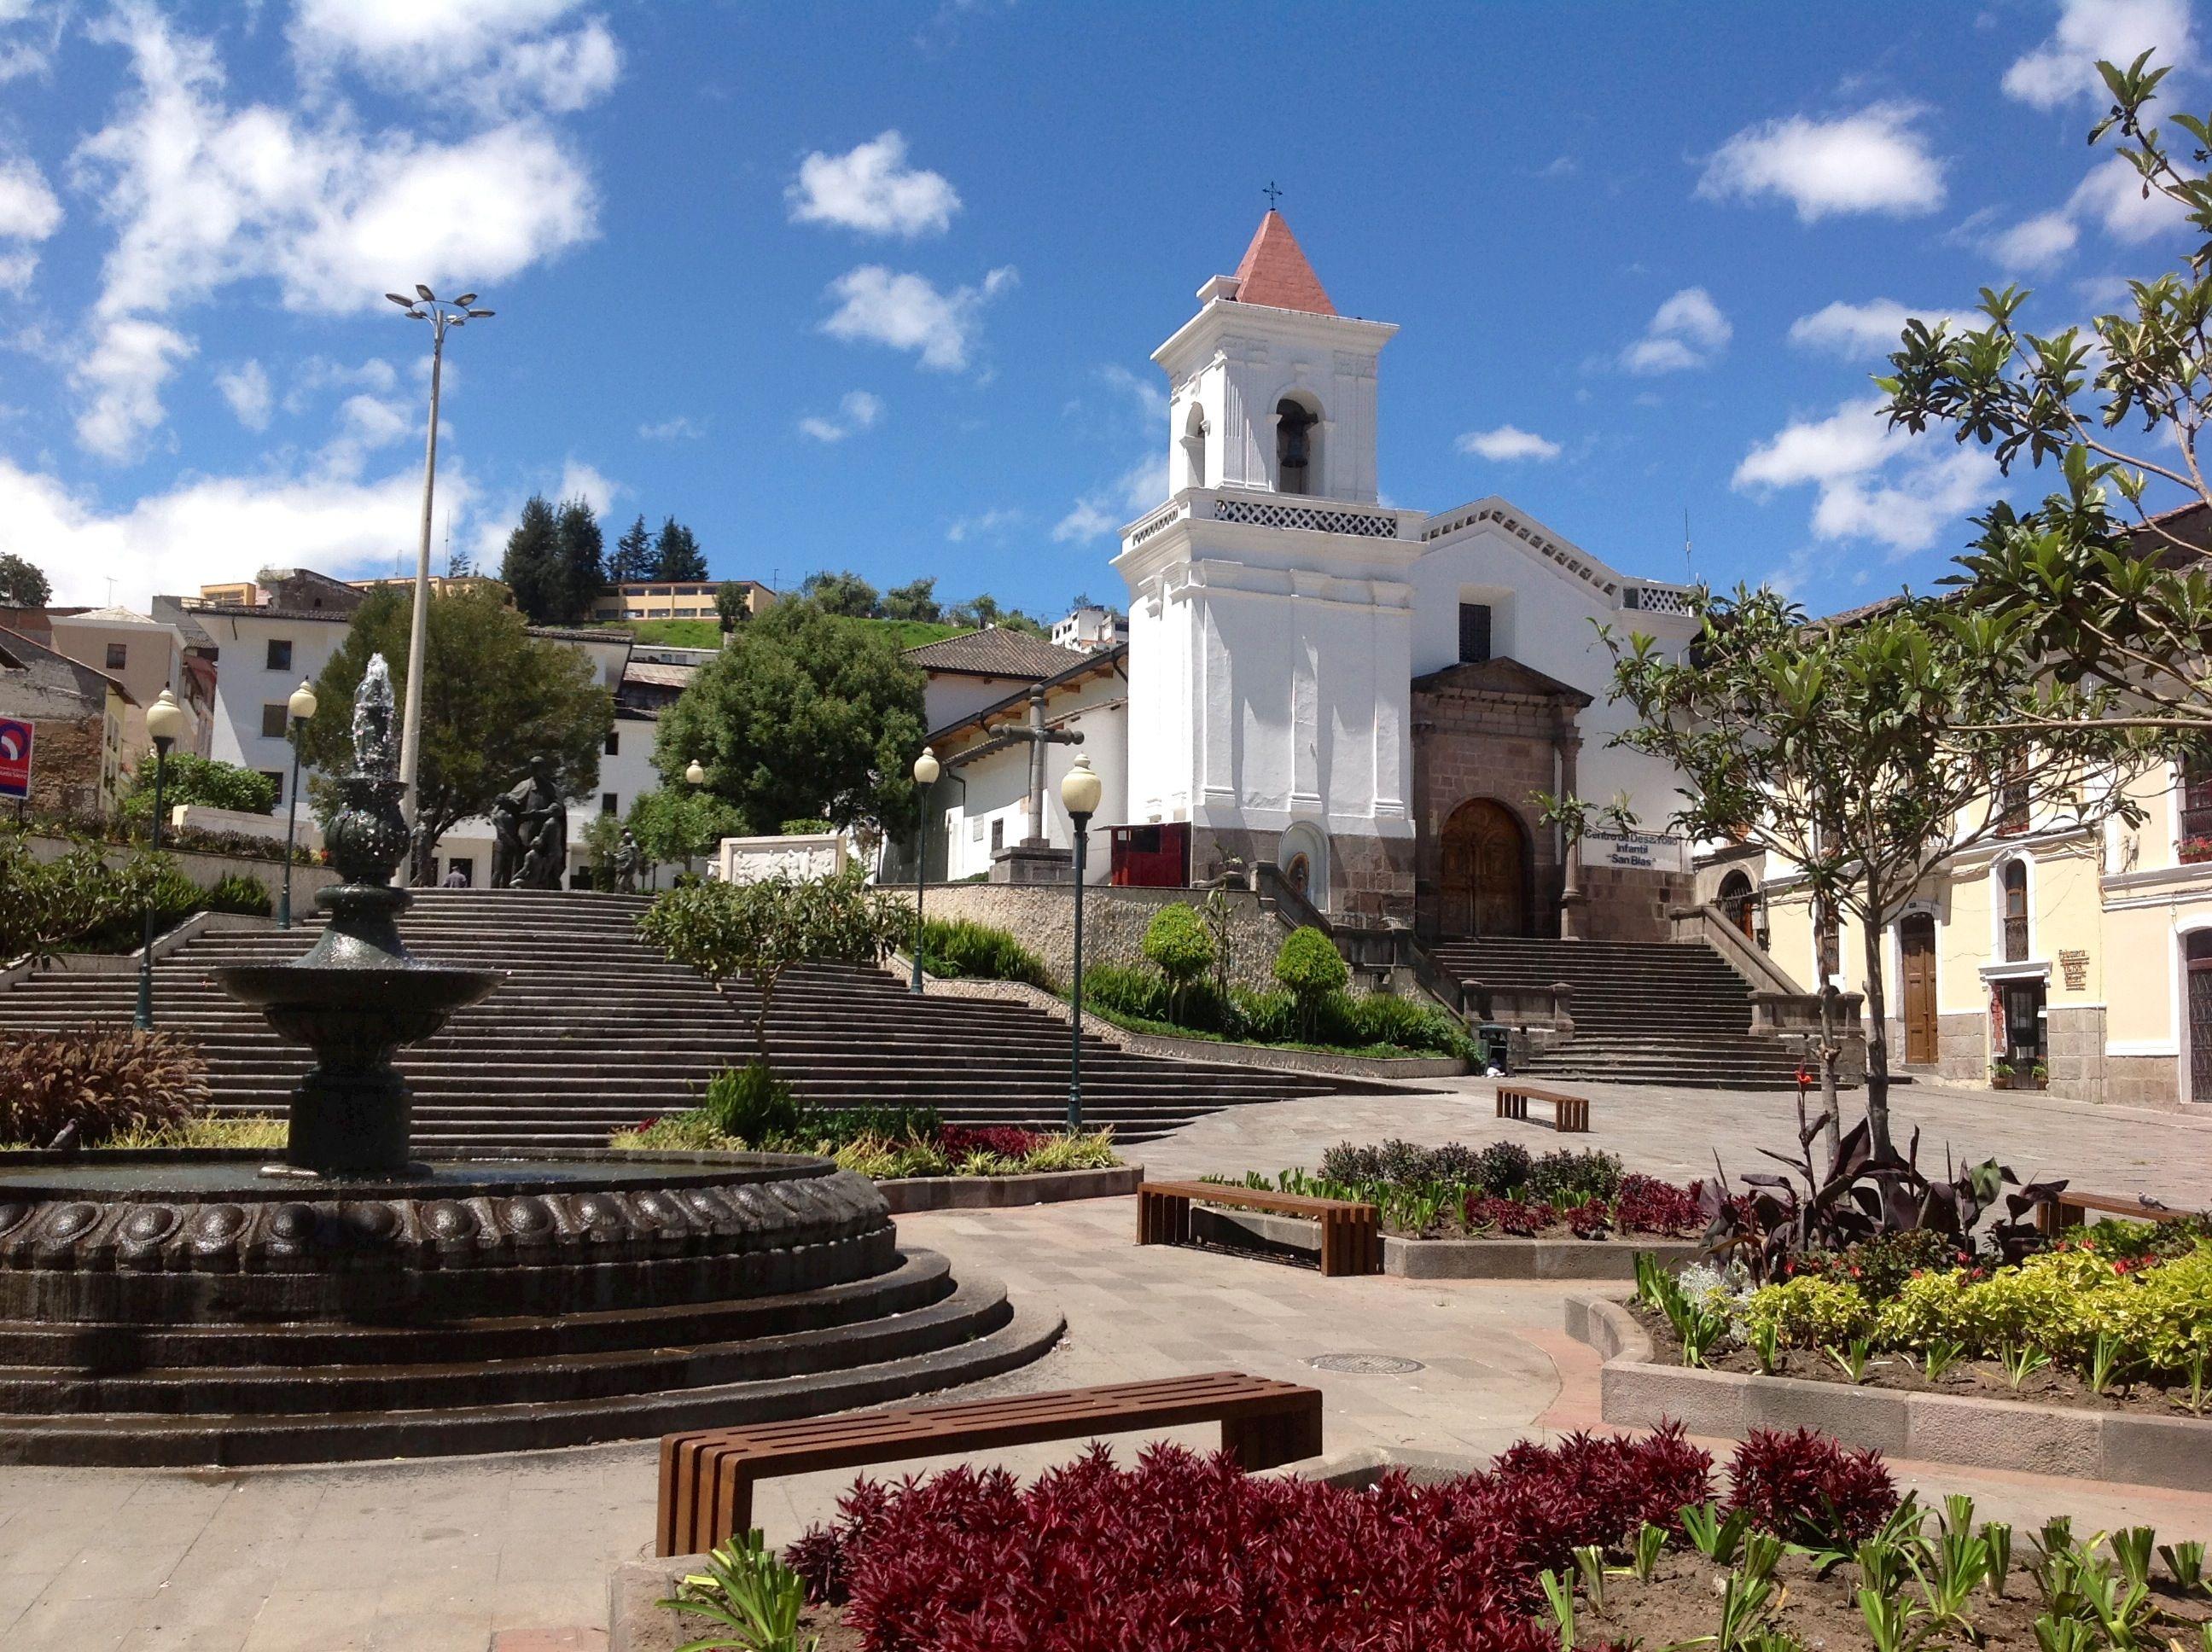 Plaza e Iglesia de San Blas. | House styles, Mansions, House